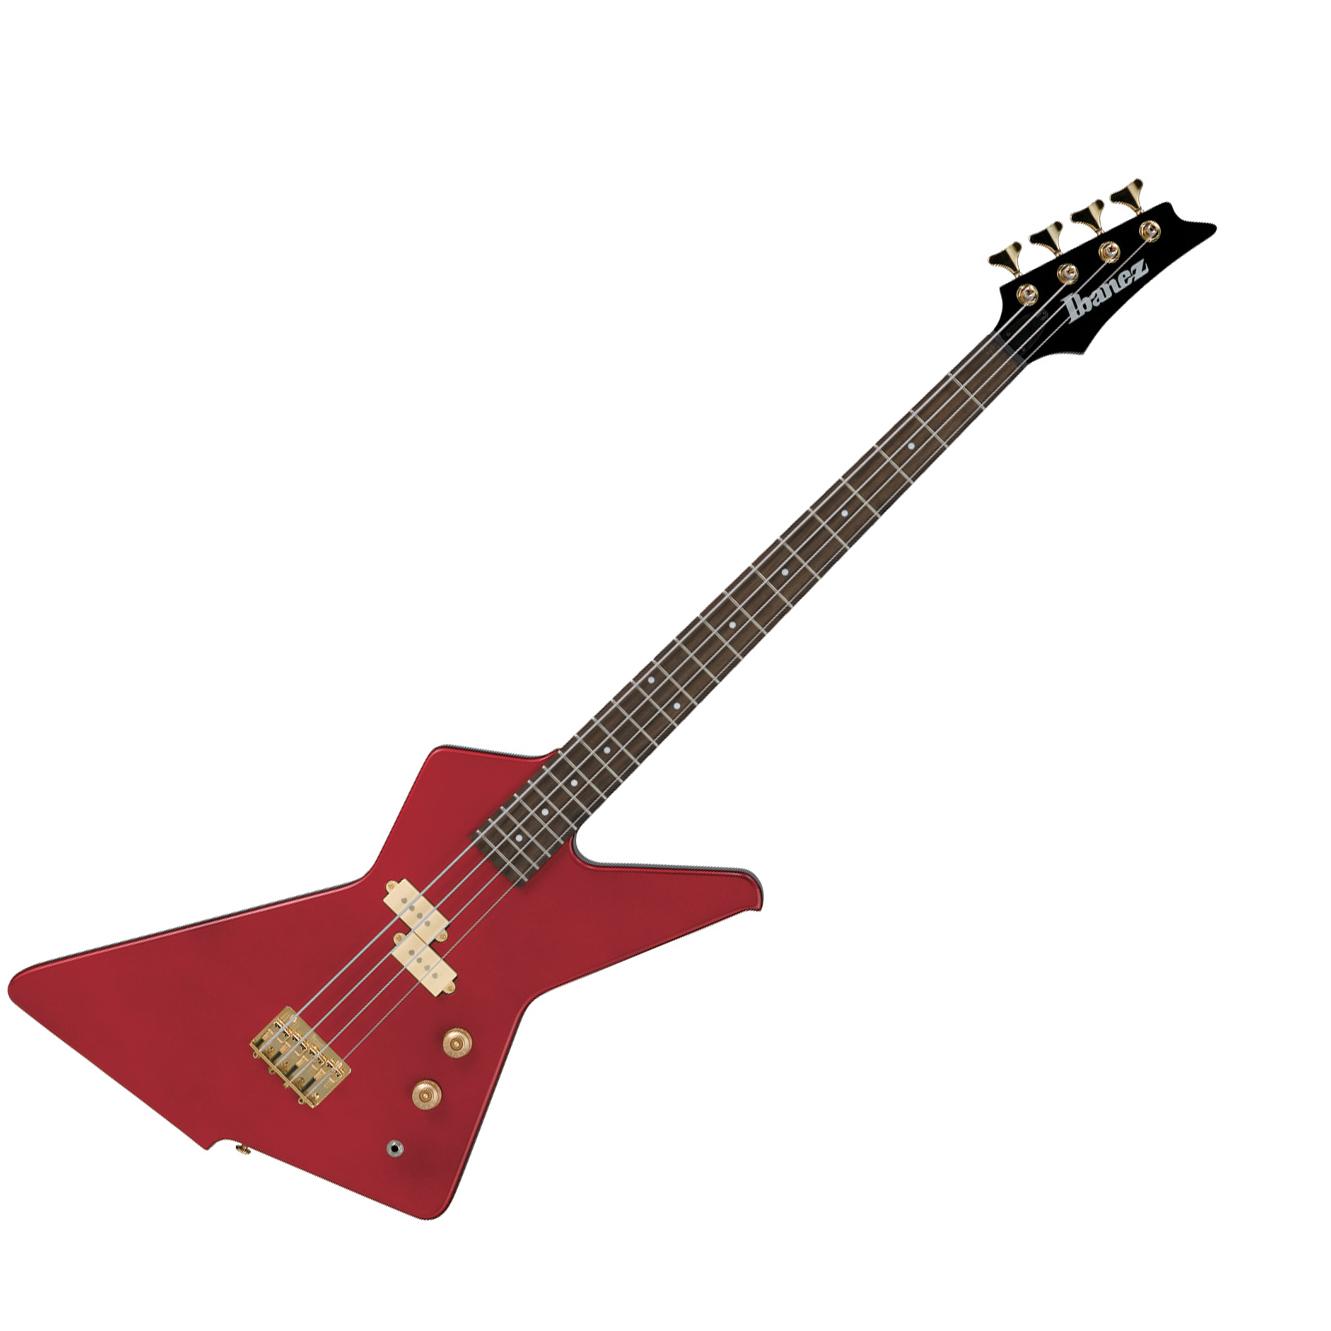 bass review for bassist ibanez destroyer bass limited edition. Black Bedroom Furniture Sets. Home Design Ideas